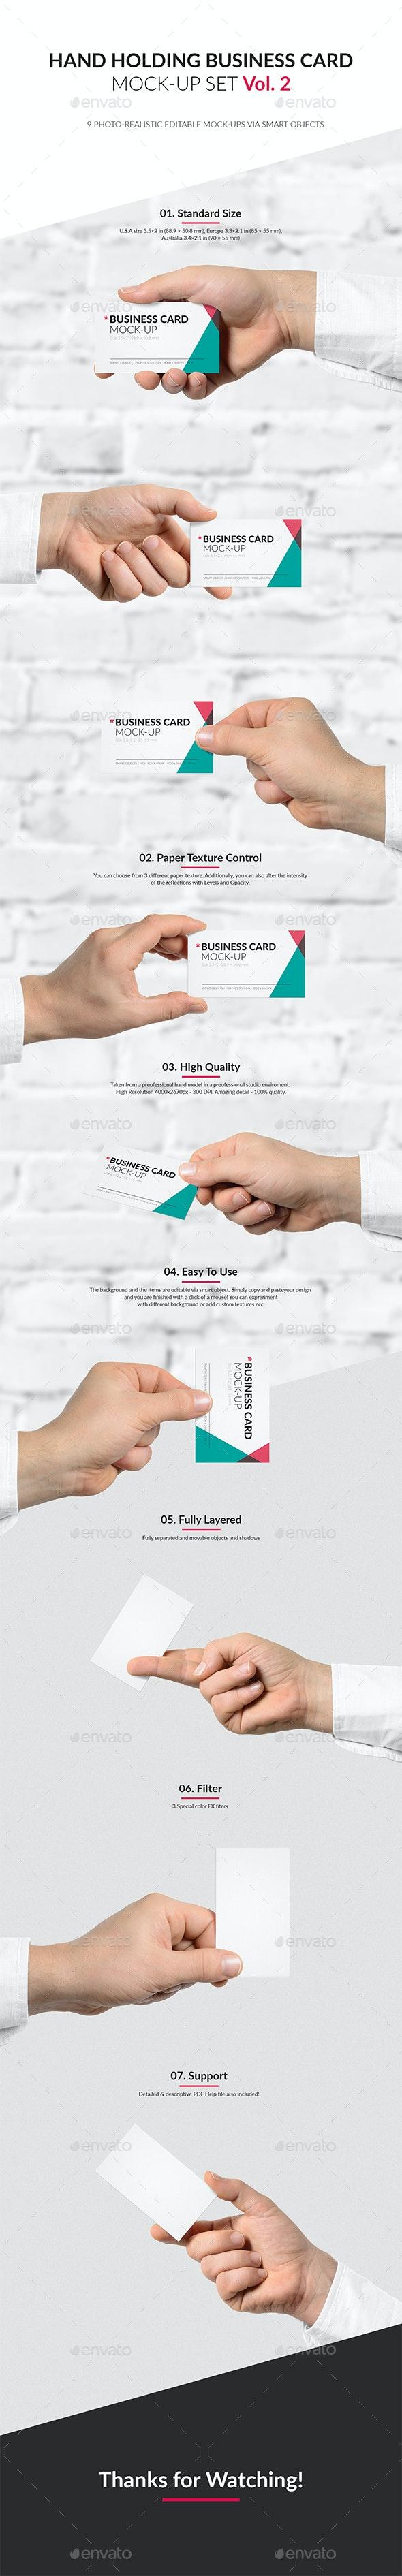 Hand Holding Business Card Mock-Up Set Vol.2 - Business Cards Print